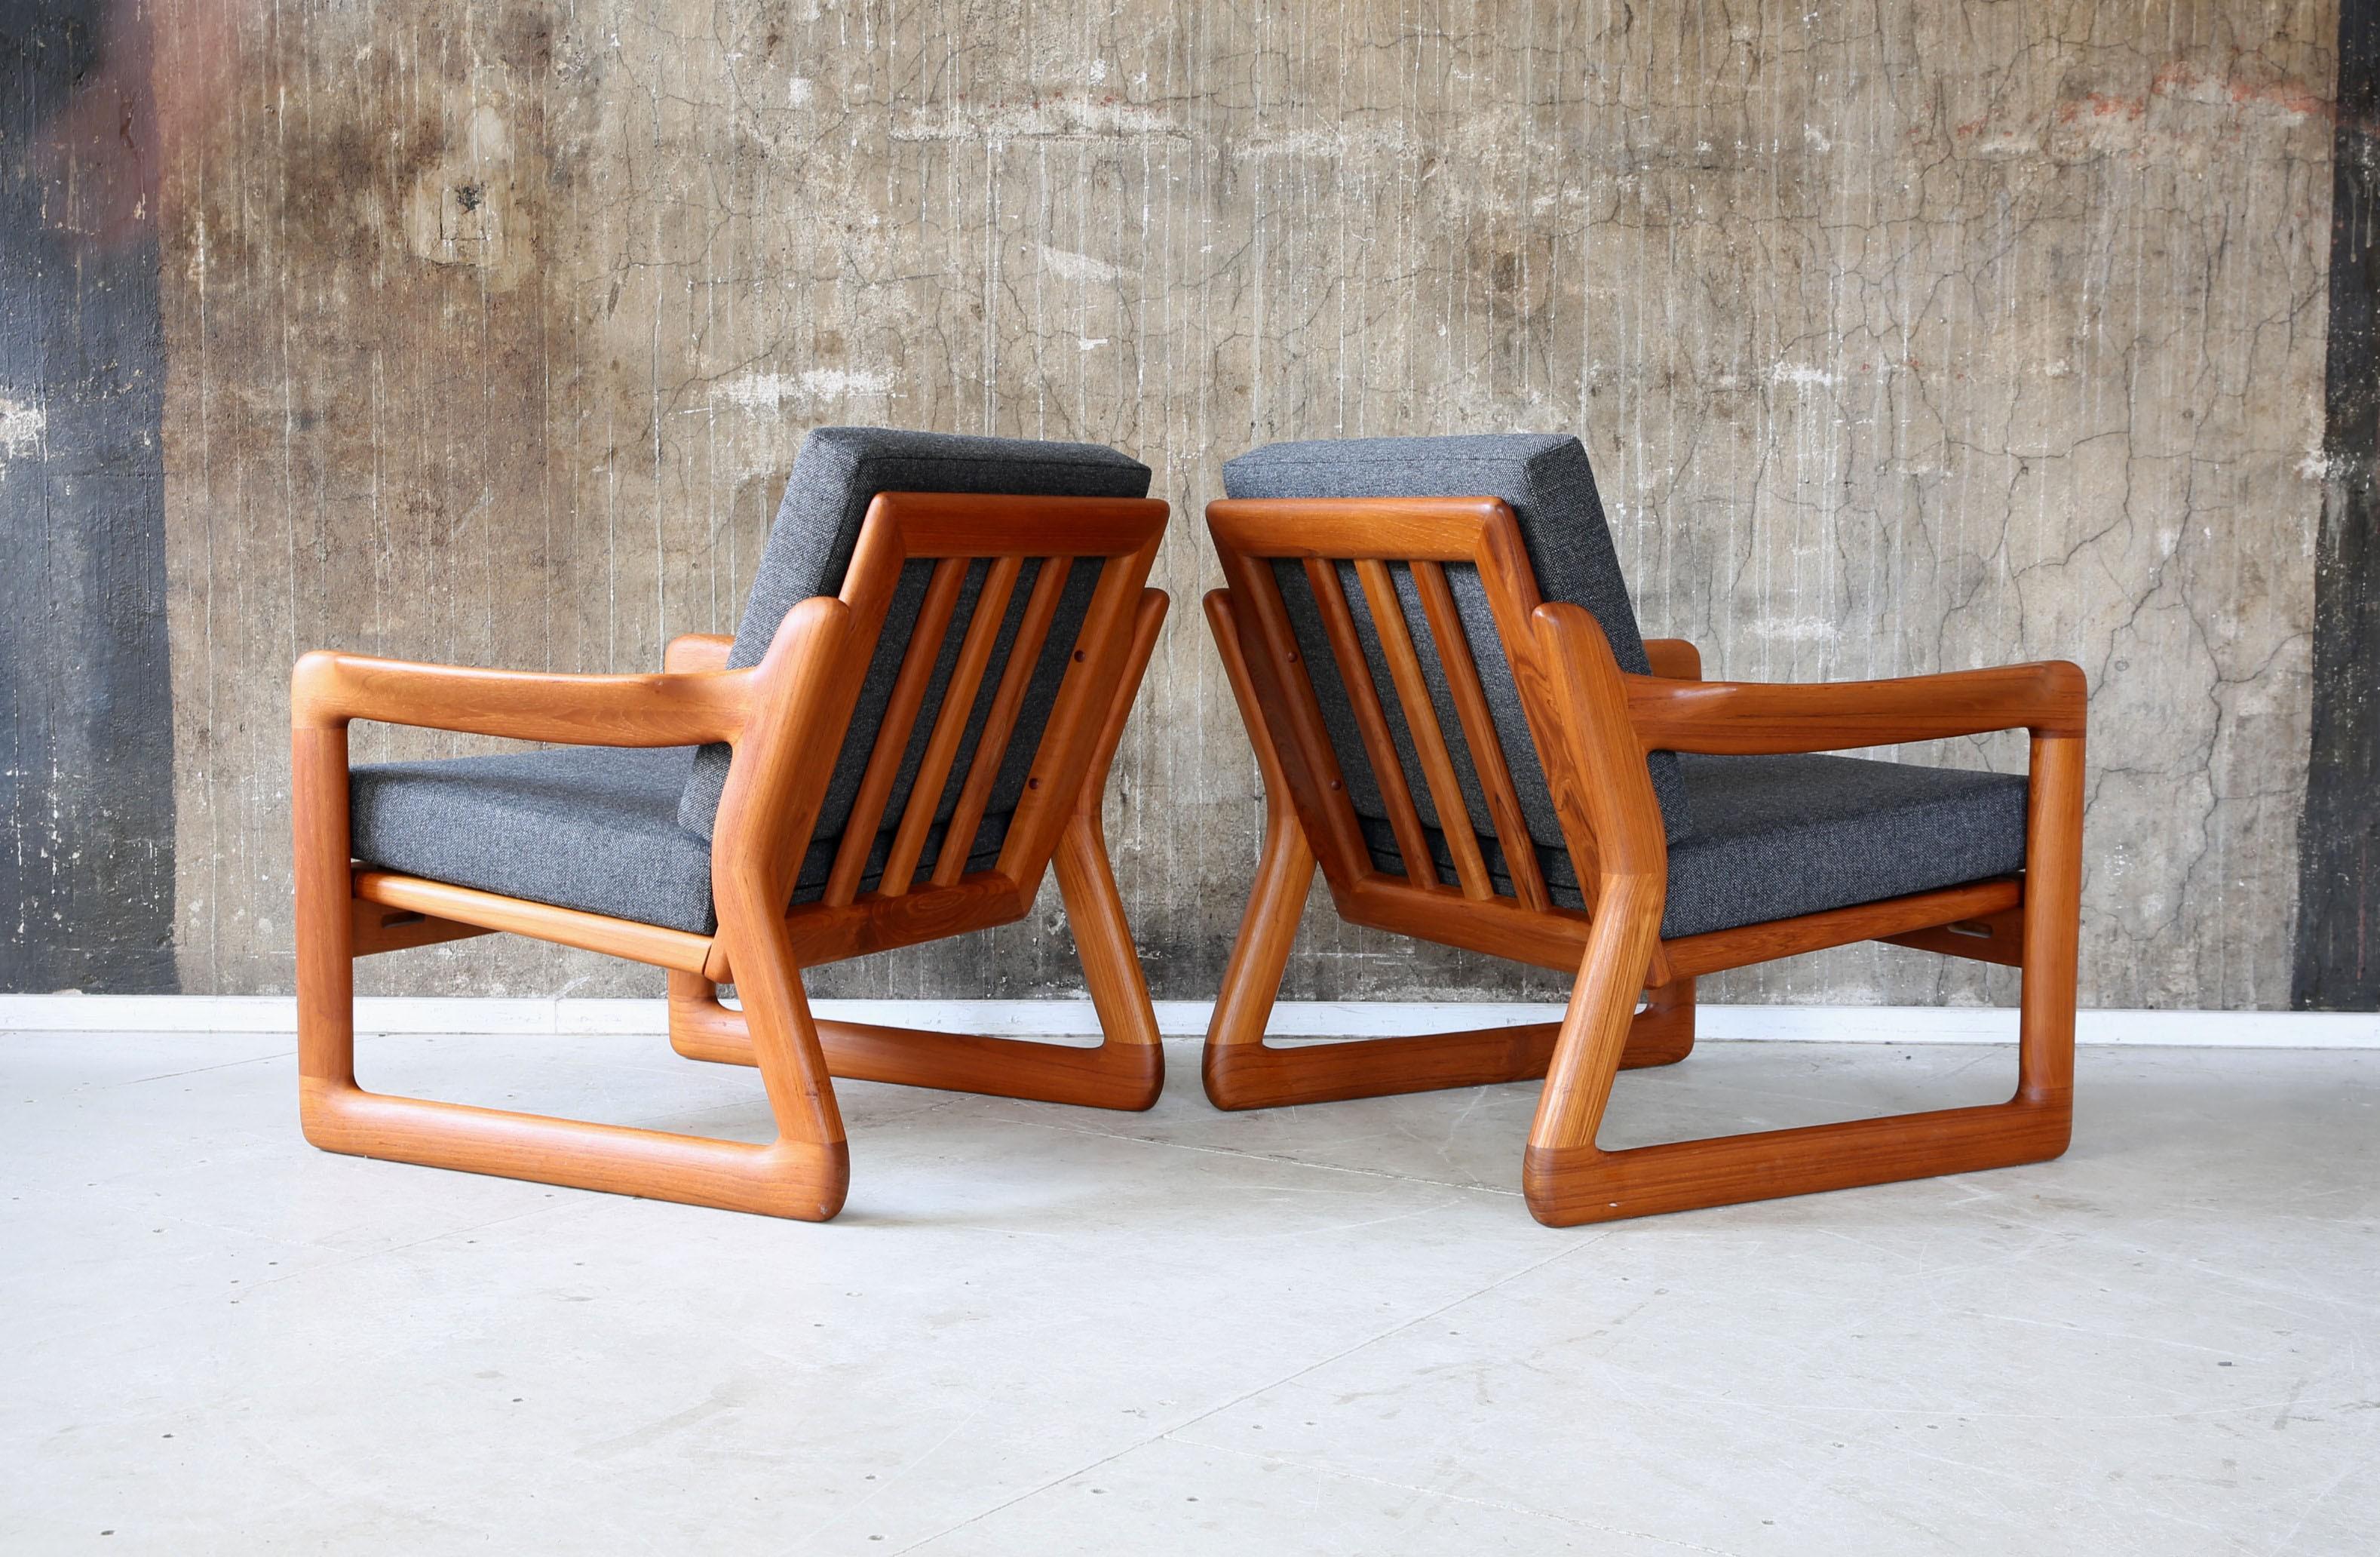 Set Of 2 Danish Vintage Easy Chair In Teak 1960s Design Market